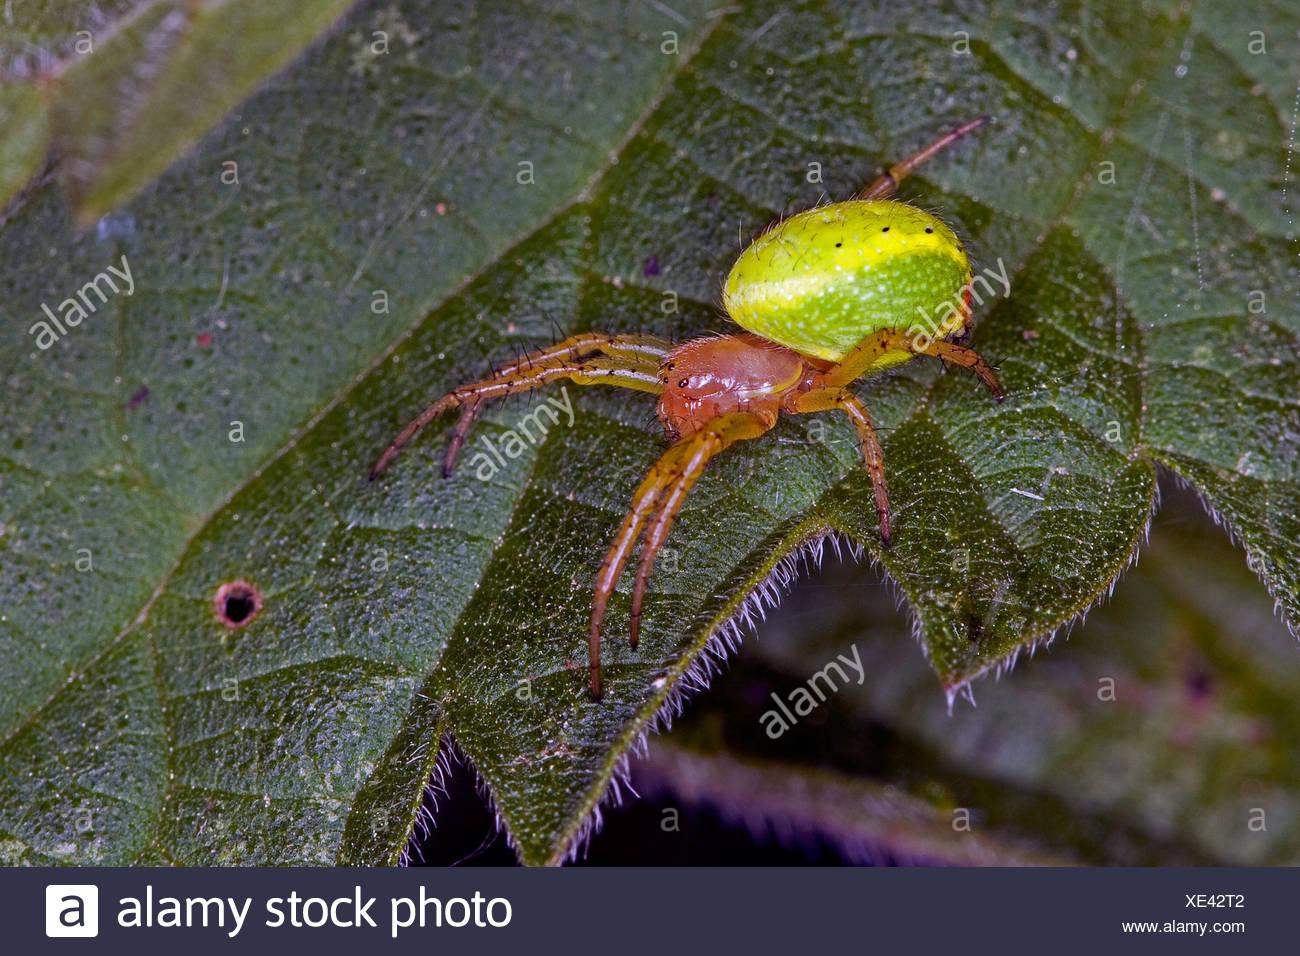 gourd spider, pumpkin spider (Araniella cucurbitina oder Araniella opistographa), sitting on a leaf, Germany - Stock Image